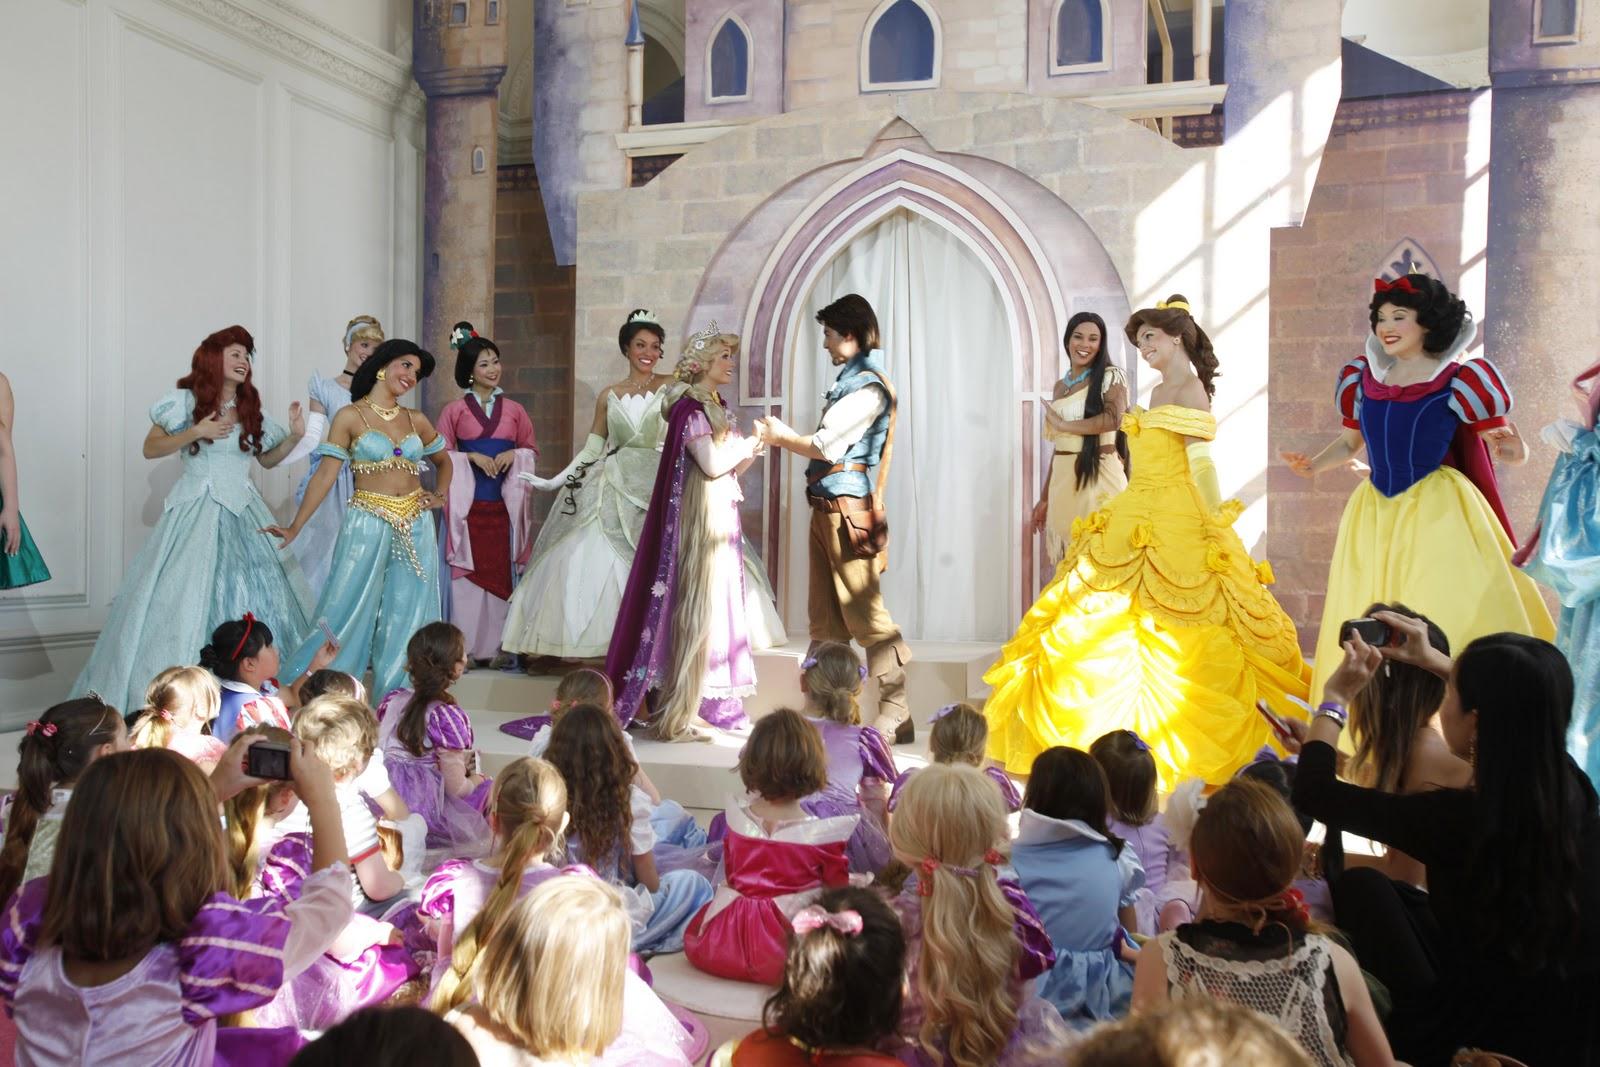 http://2.bp.blogspot.com/-FsJkvBzq4OY/Tsq5URMDEEI/AAAAAAAABGw/IeUj0WxyLjw/s1600/Disney+Princess+-+Kensington+Palace2.JPG